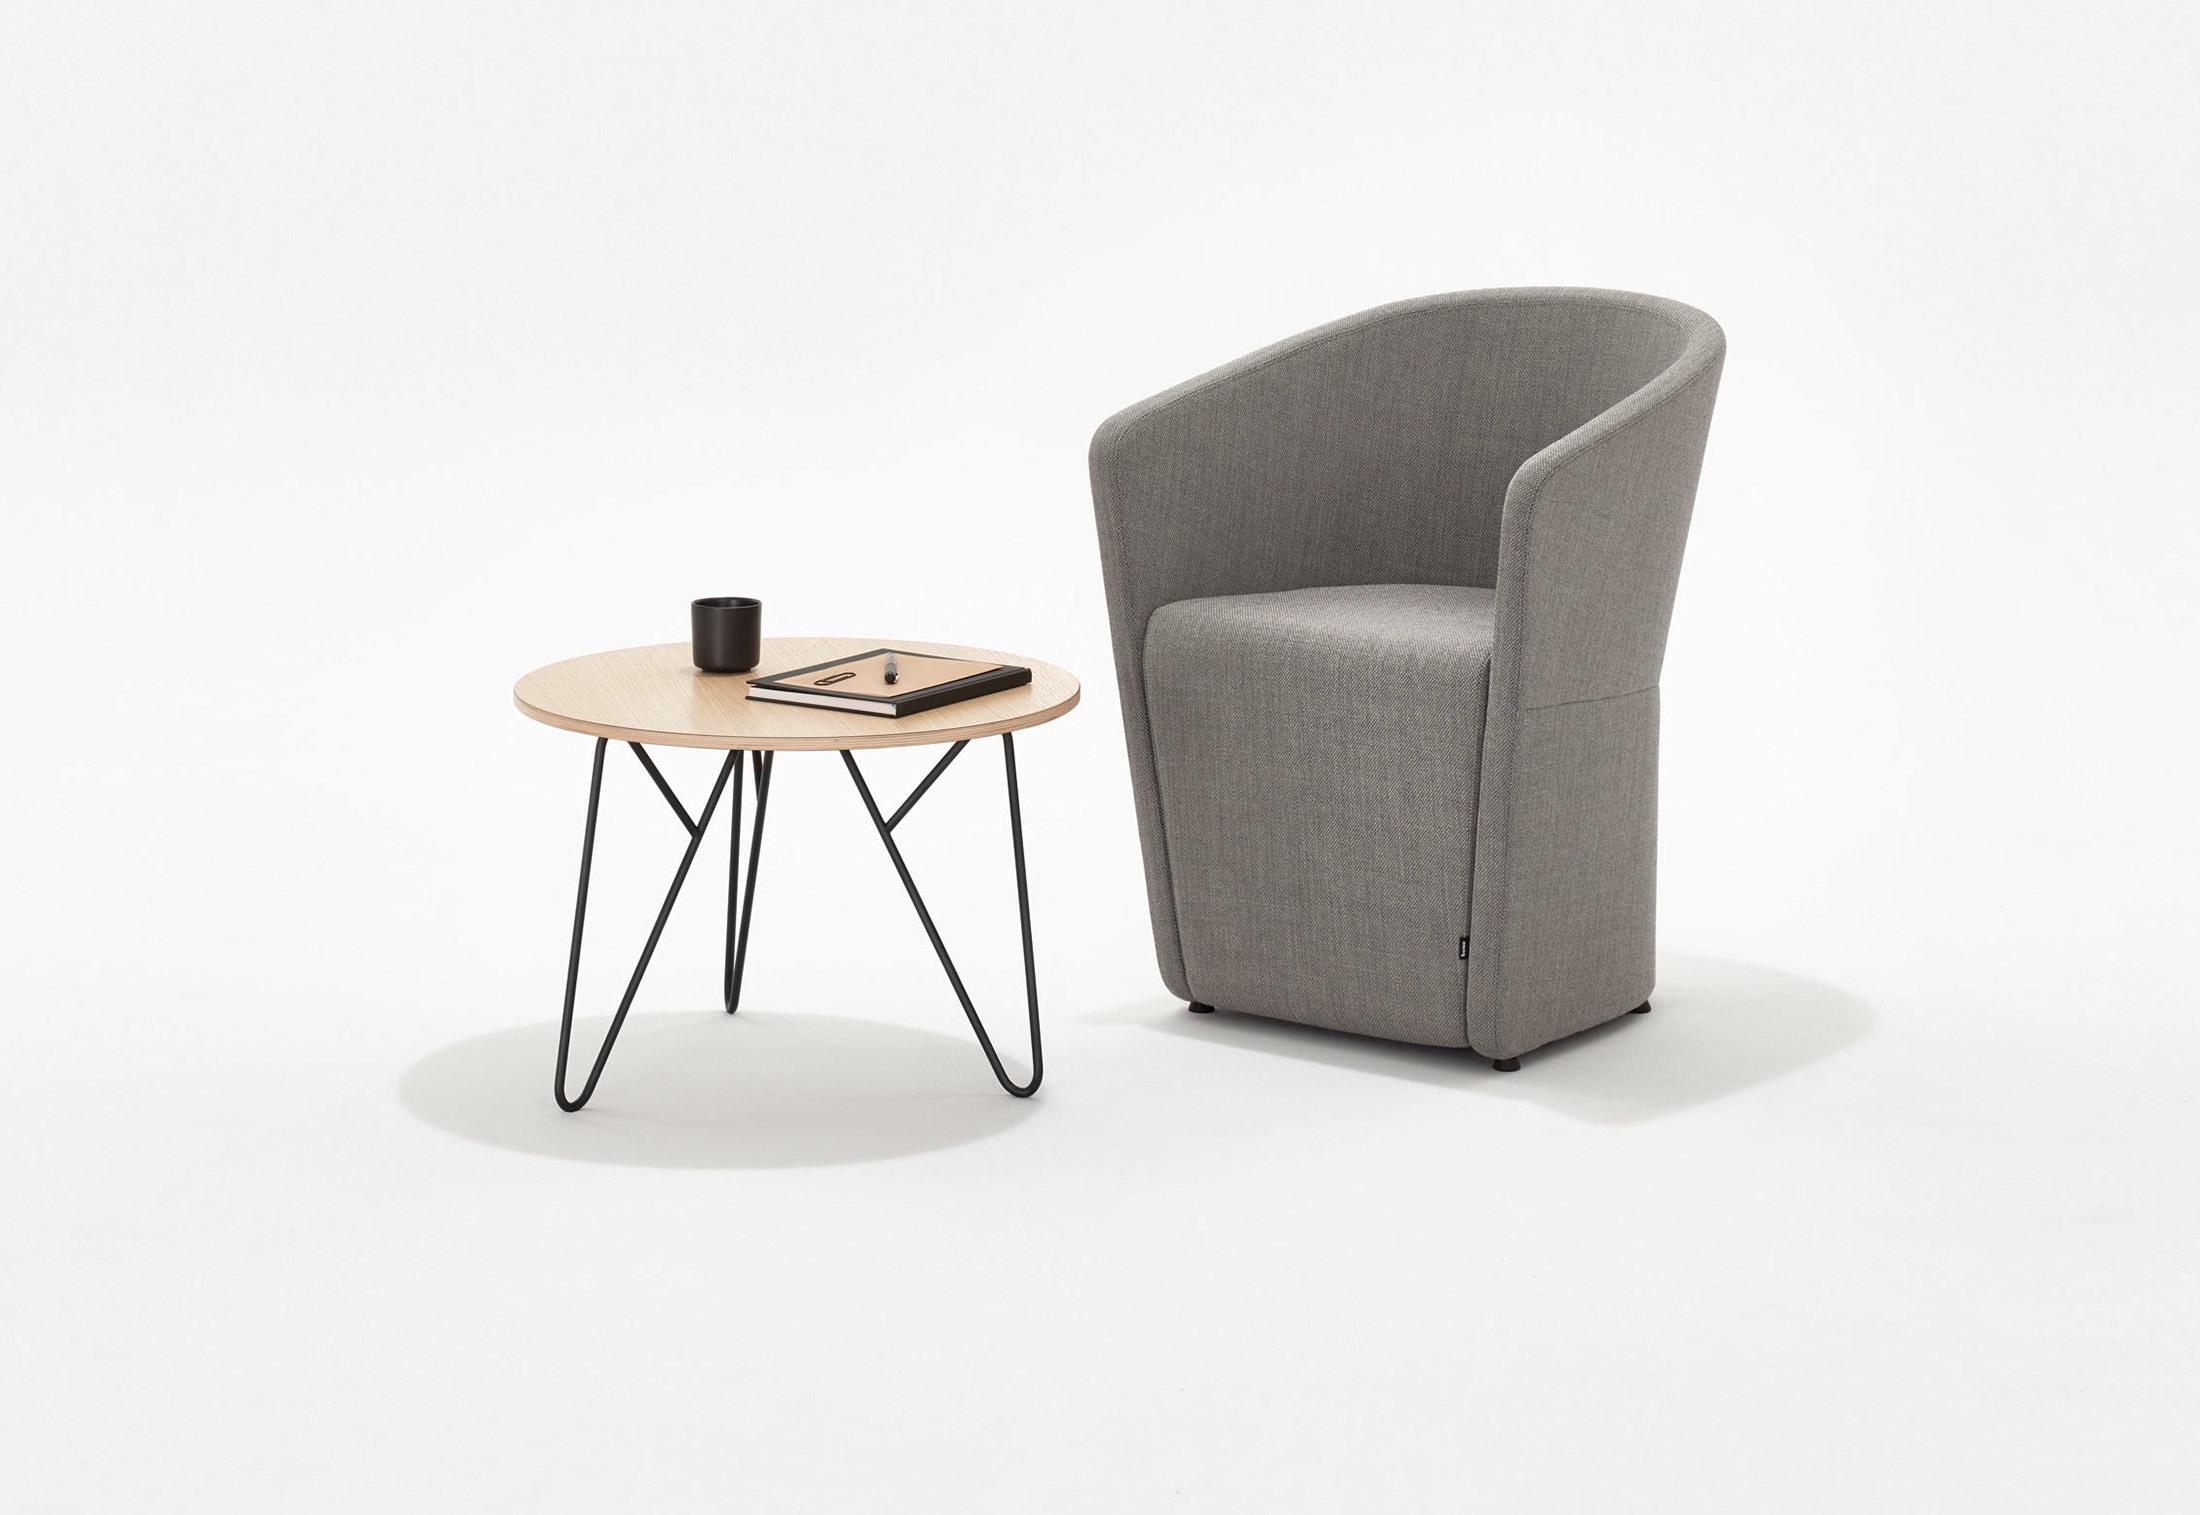 Studio Side Tables By Bene Stylepark